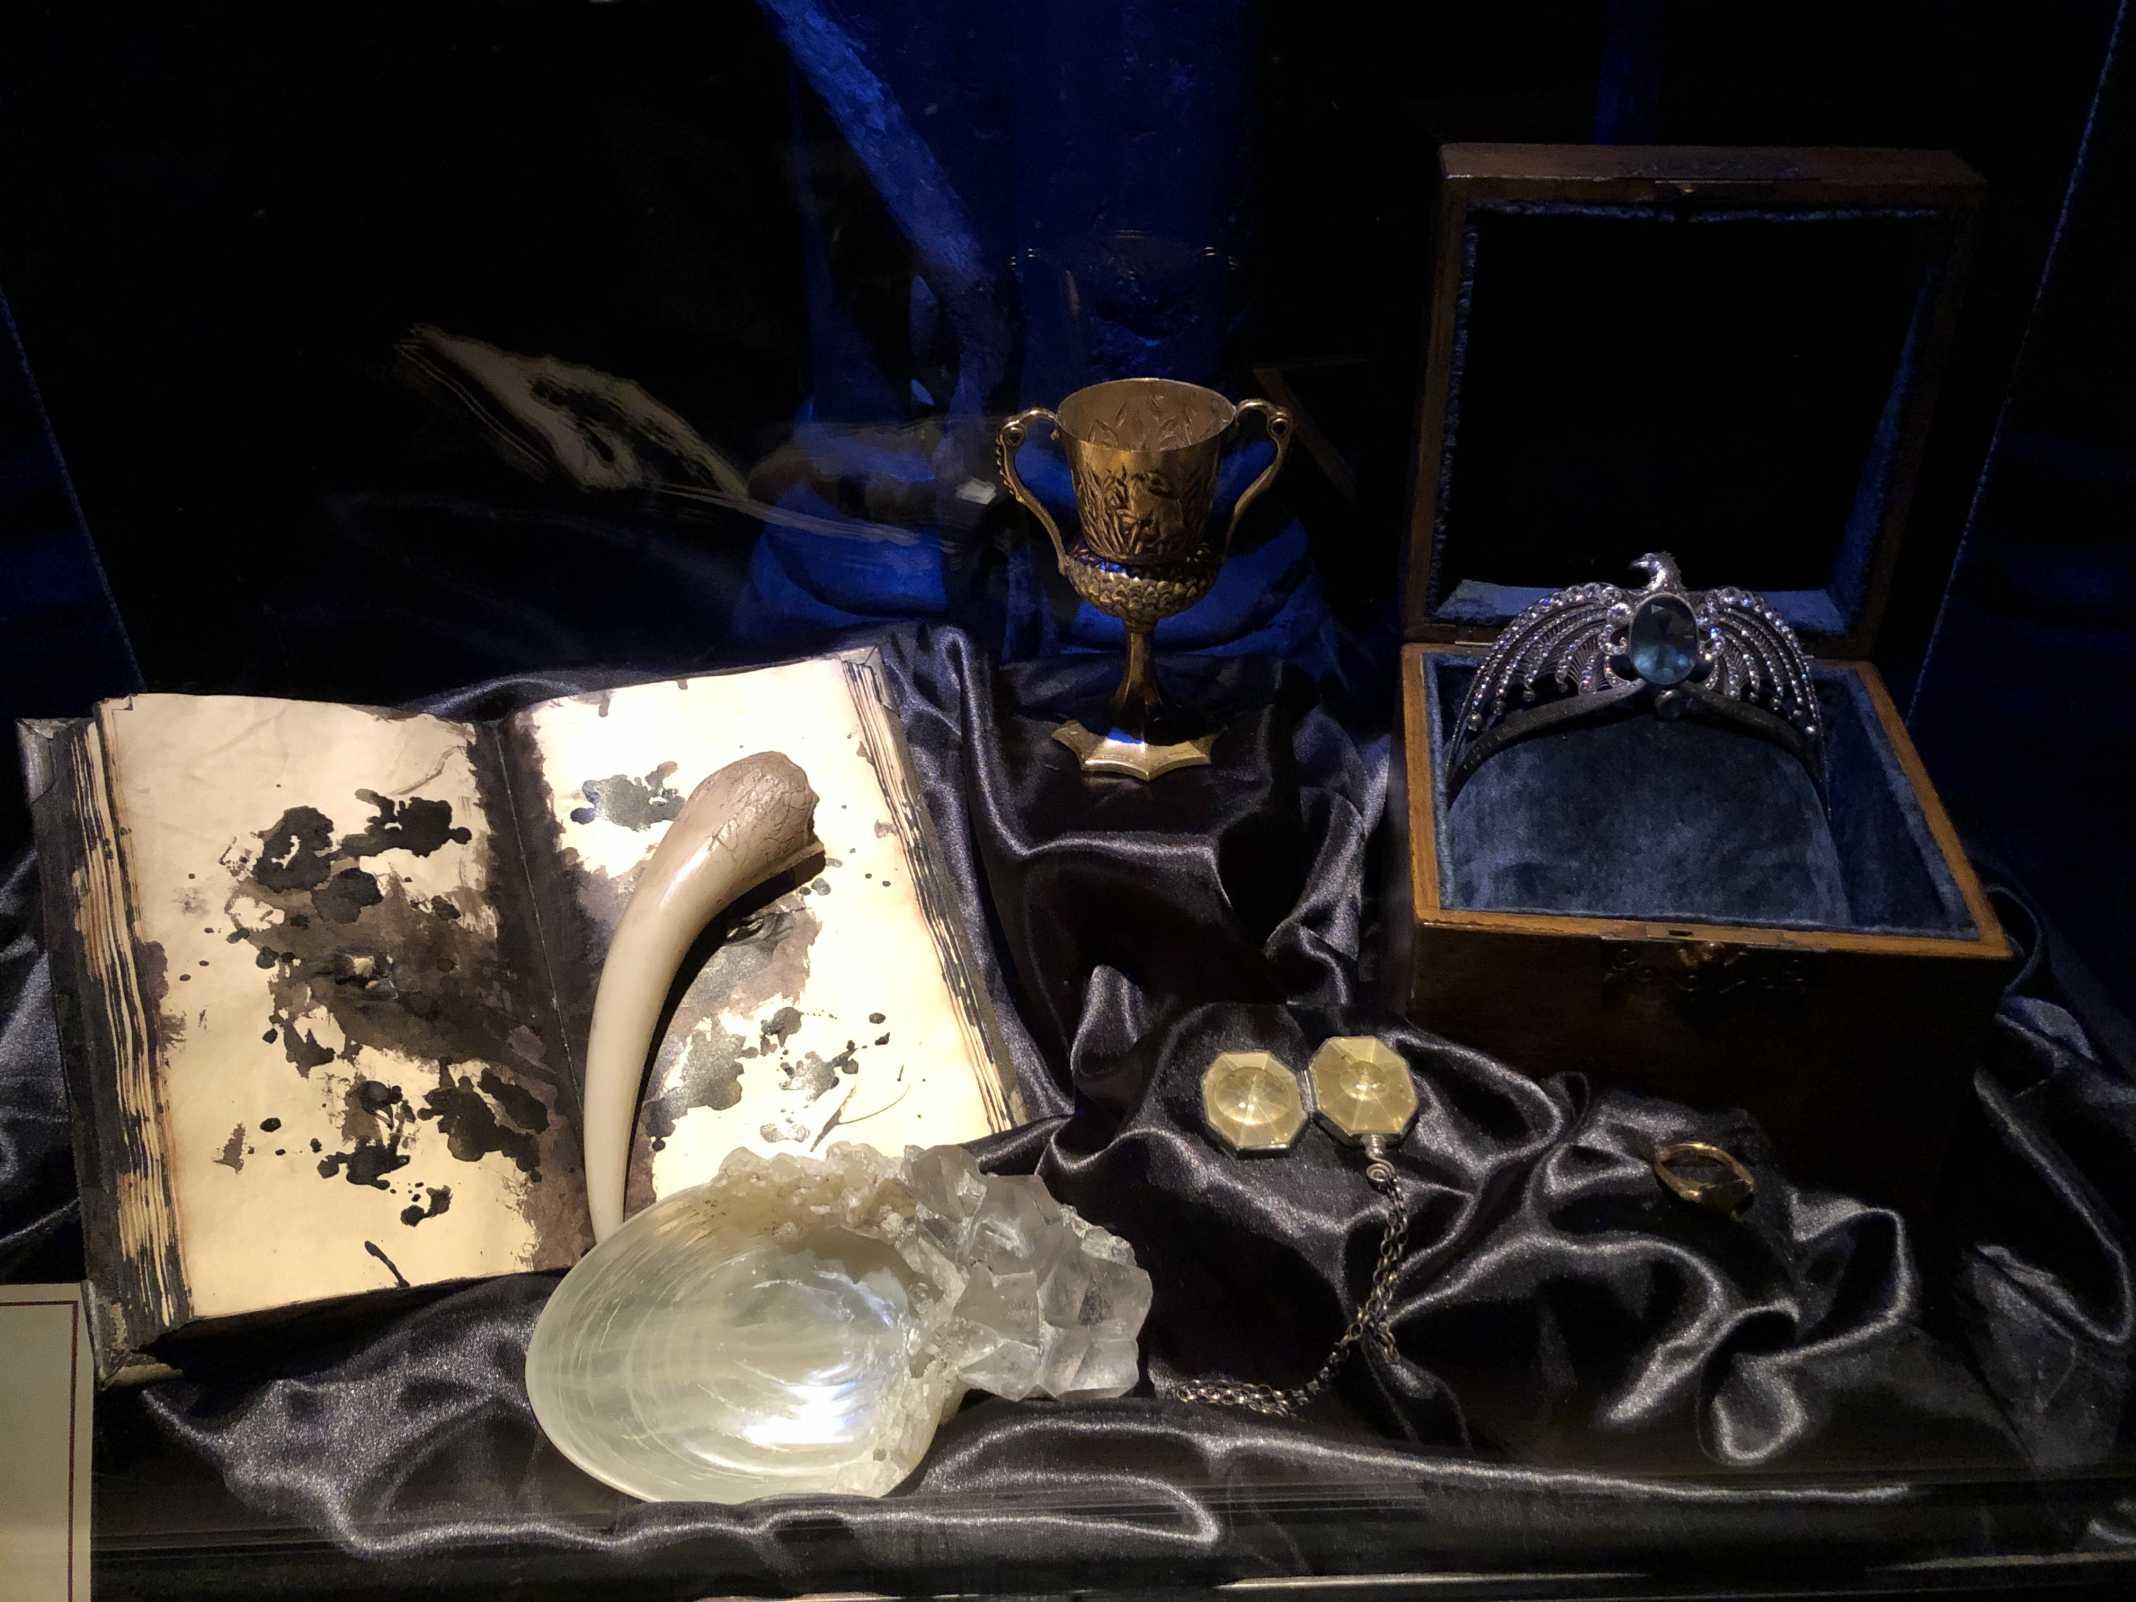 Horcruxes Harry Potter Exhibition